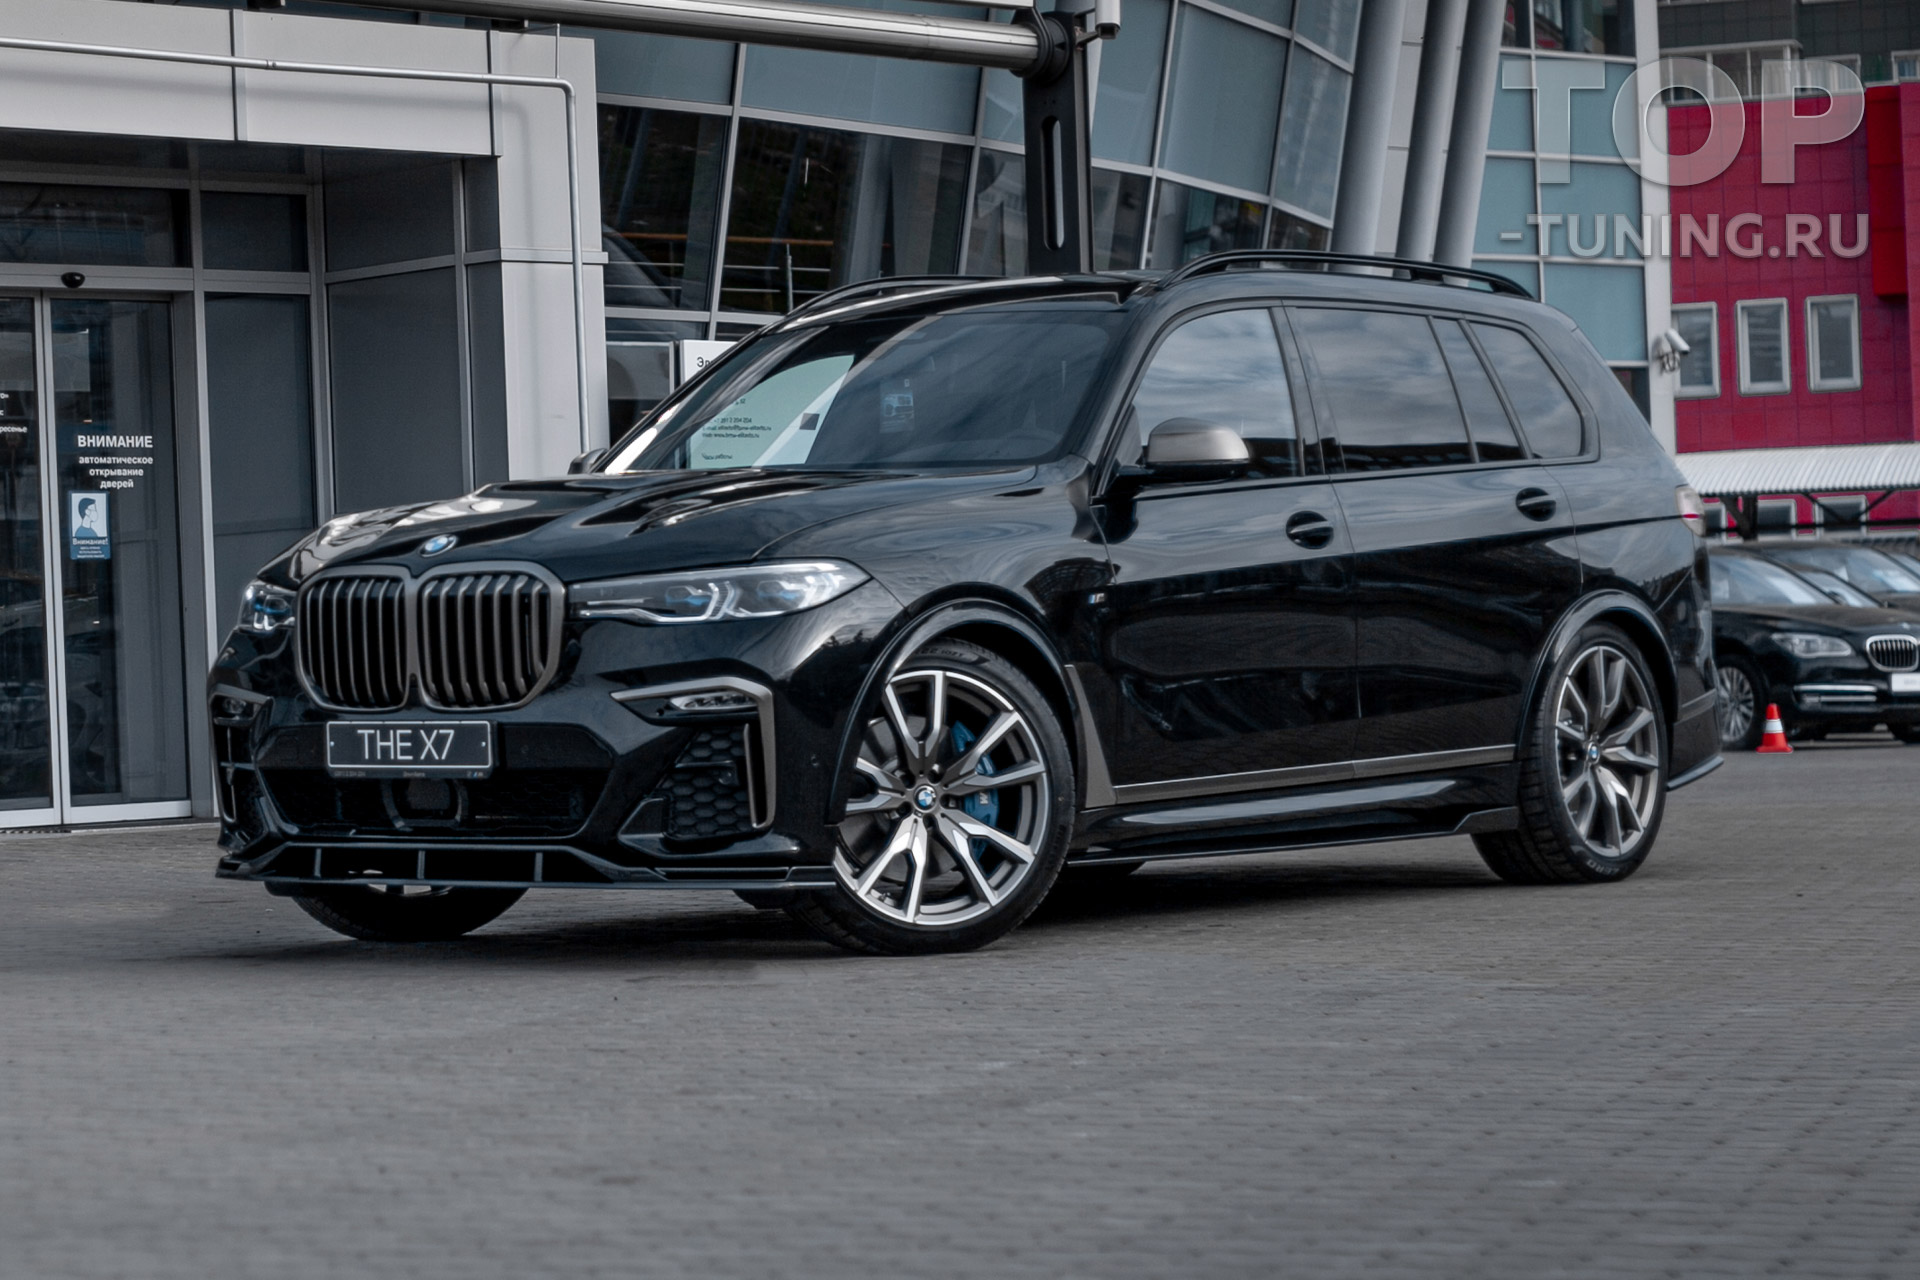 10218 Расширители арок +30 mm. Renegade для BMW X7 G07 2018+